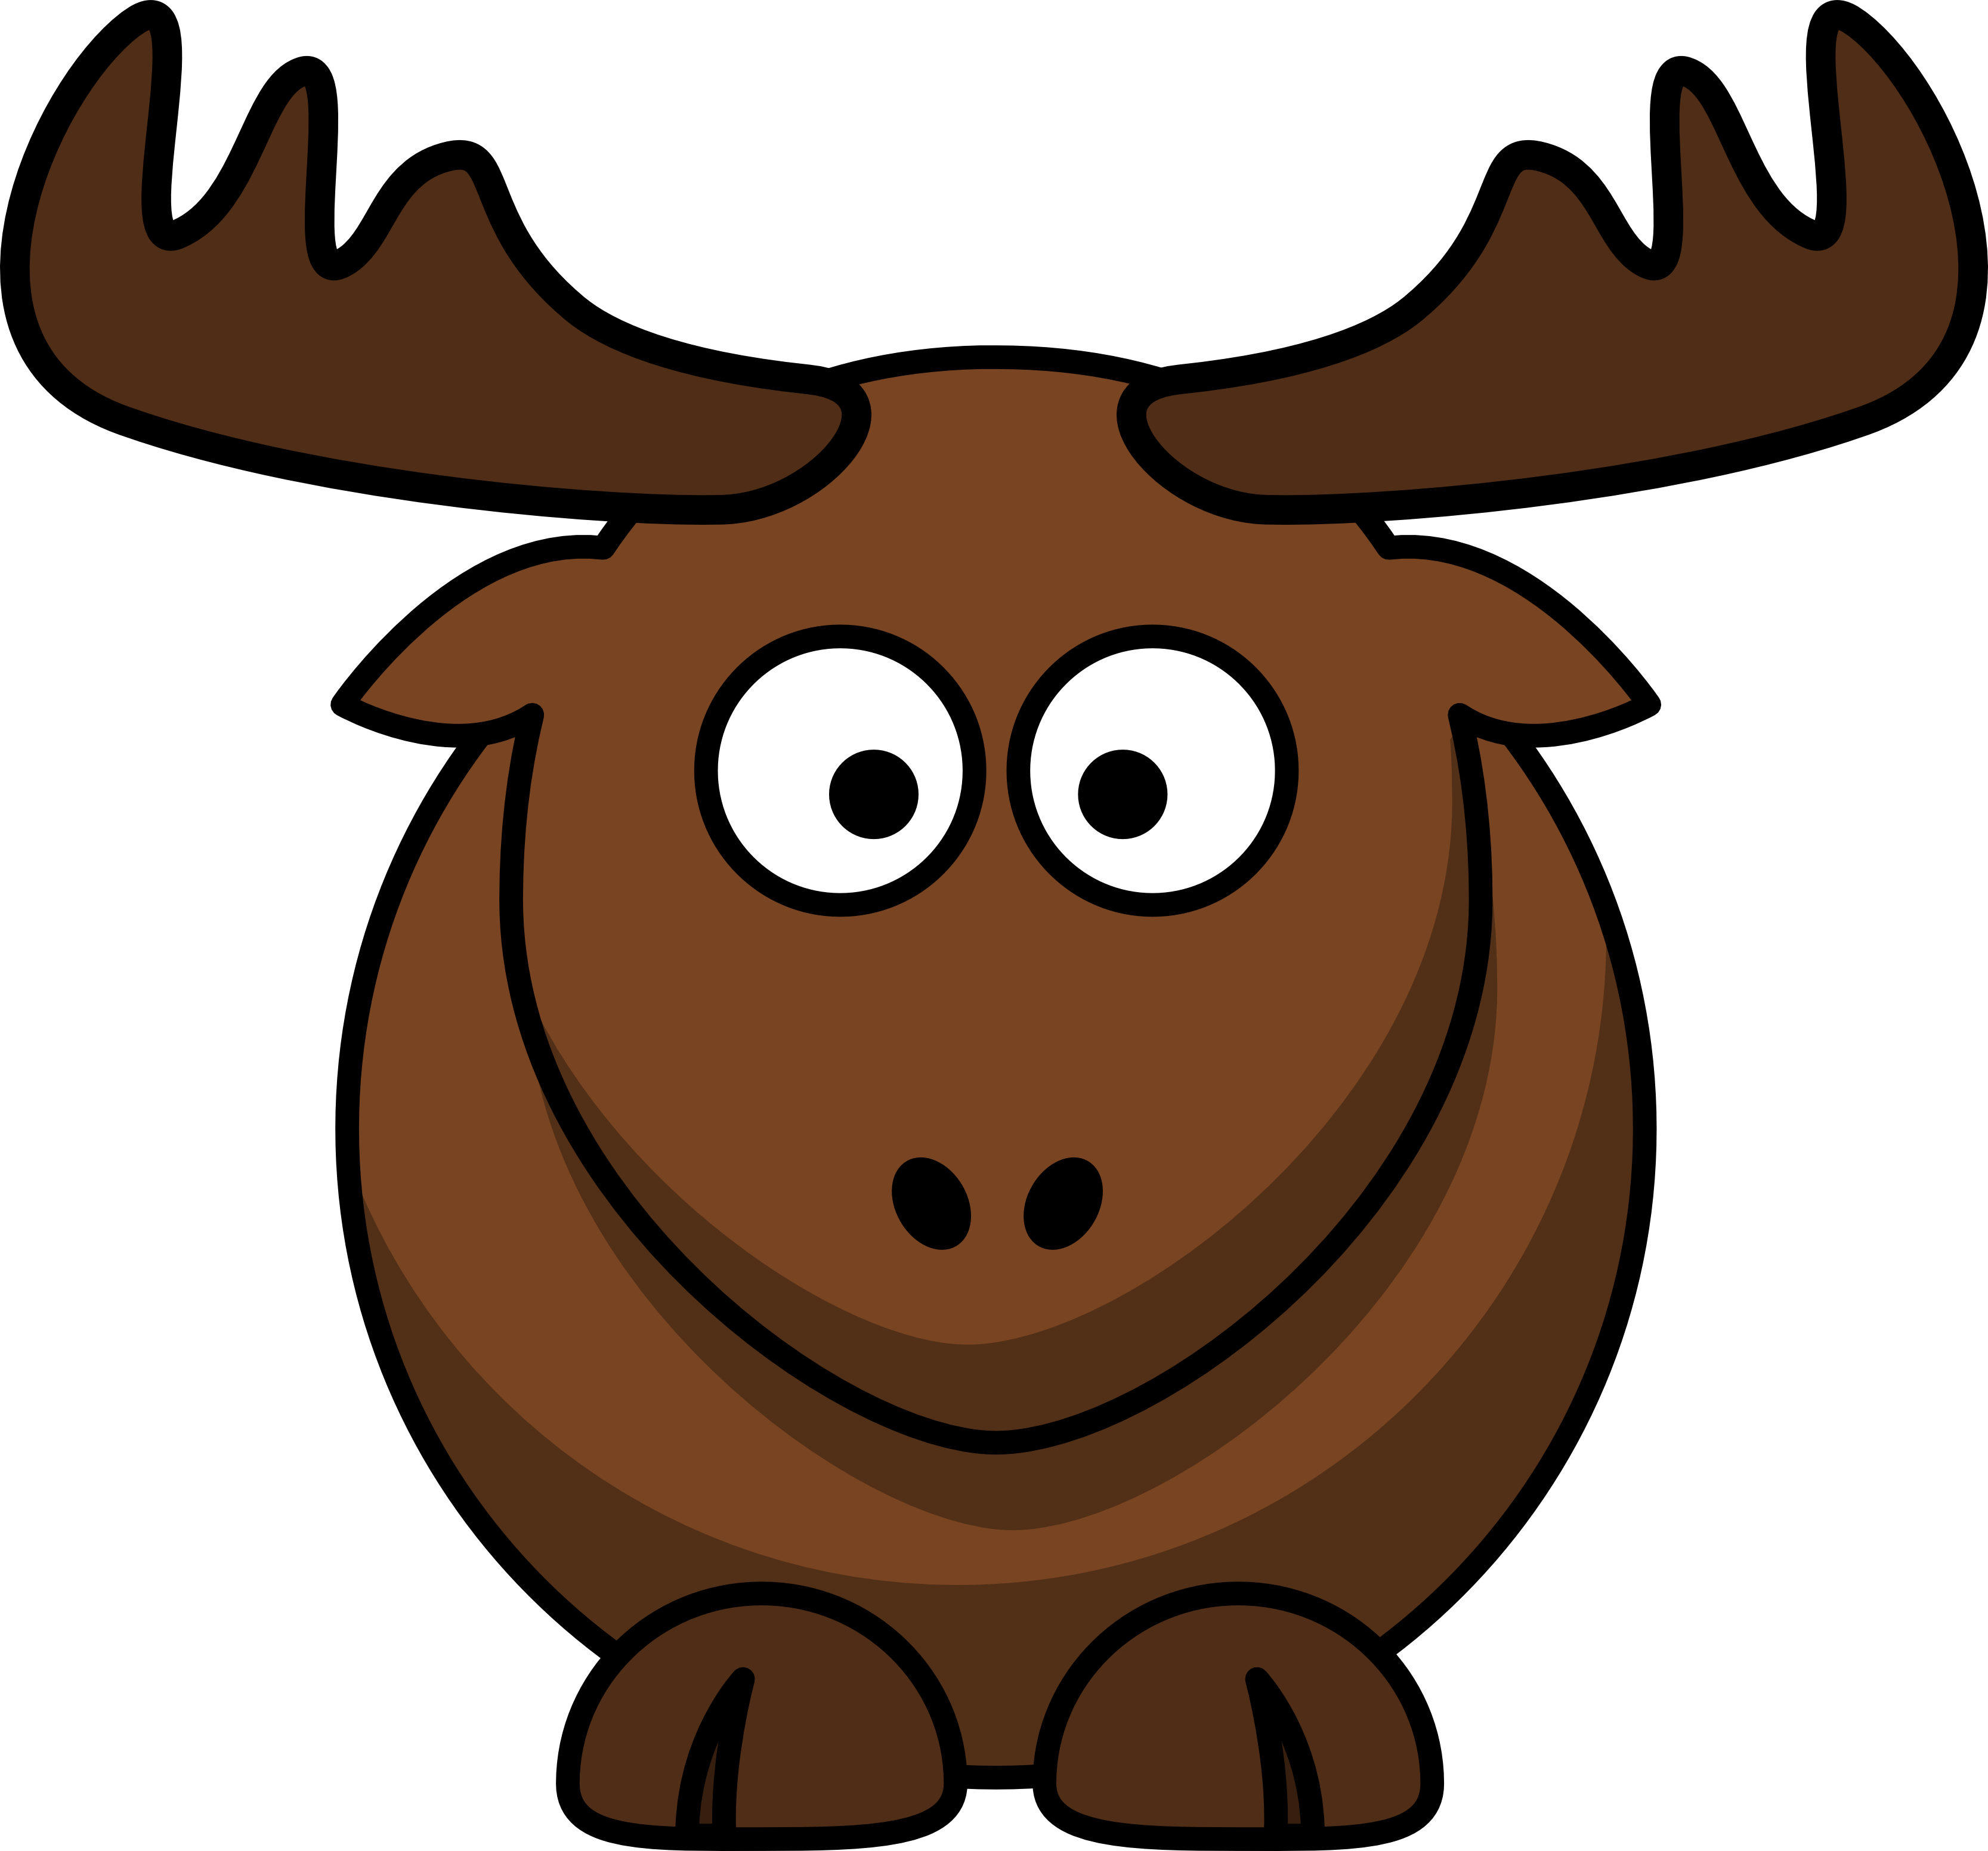 Moose clipart sad #1